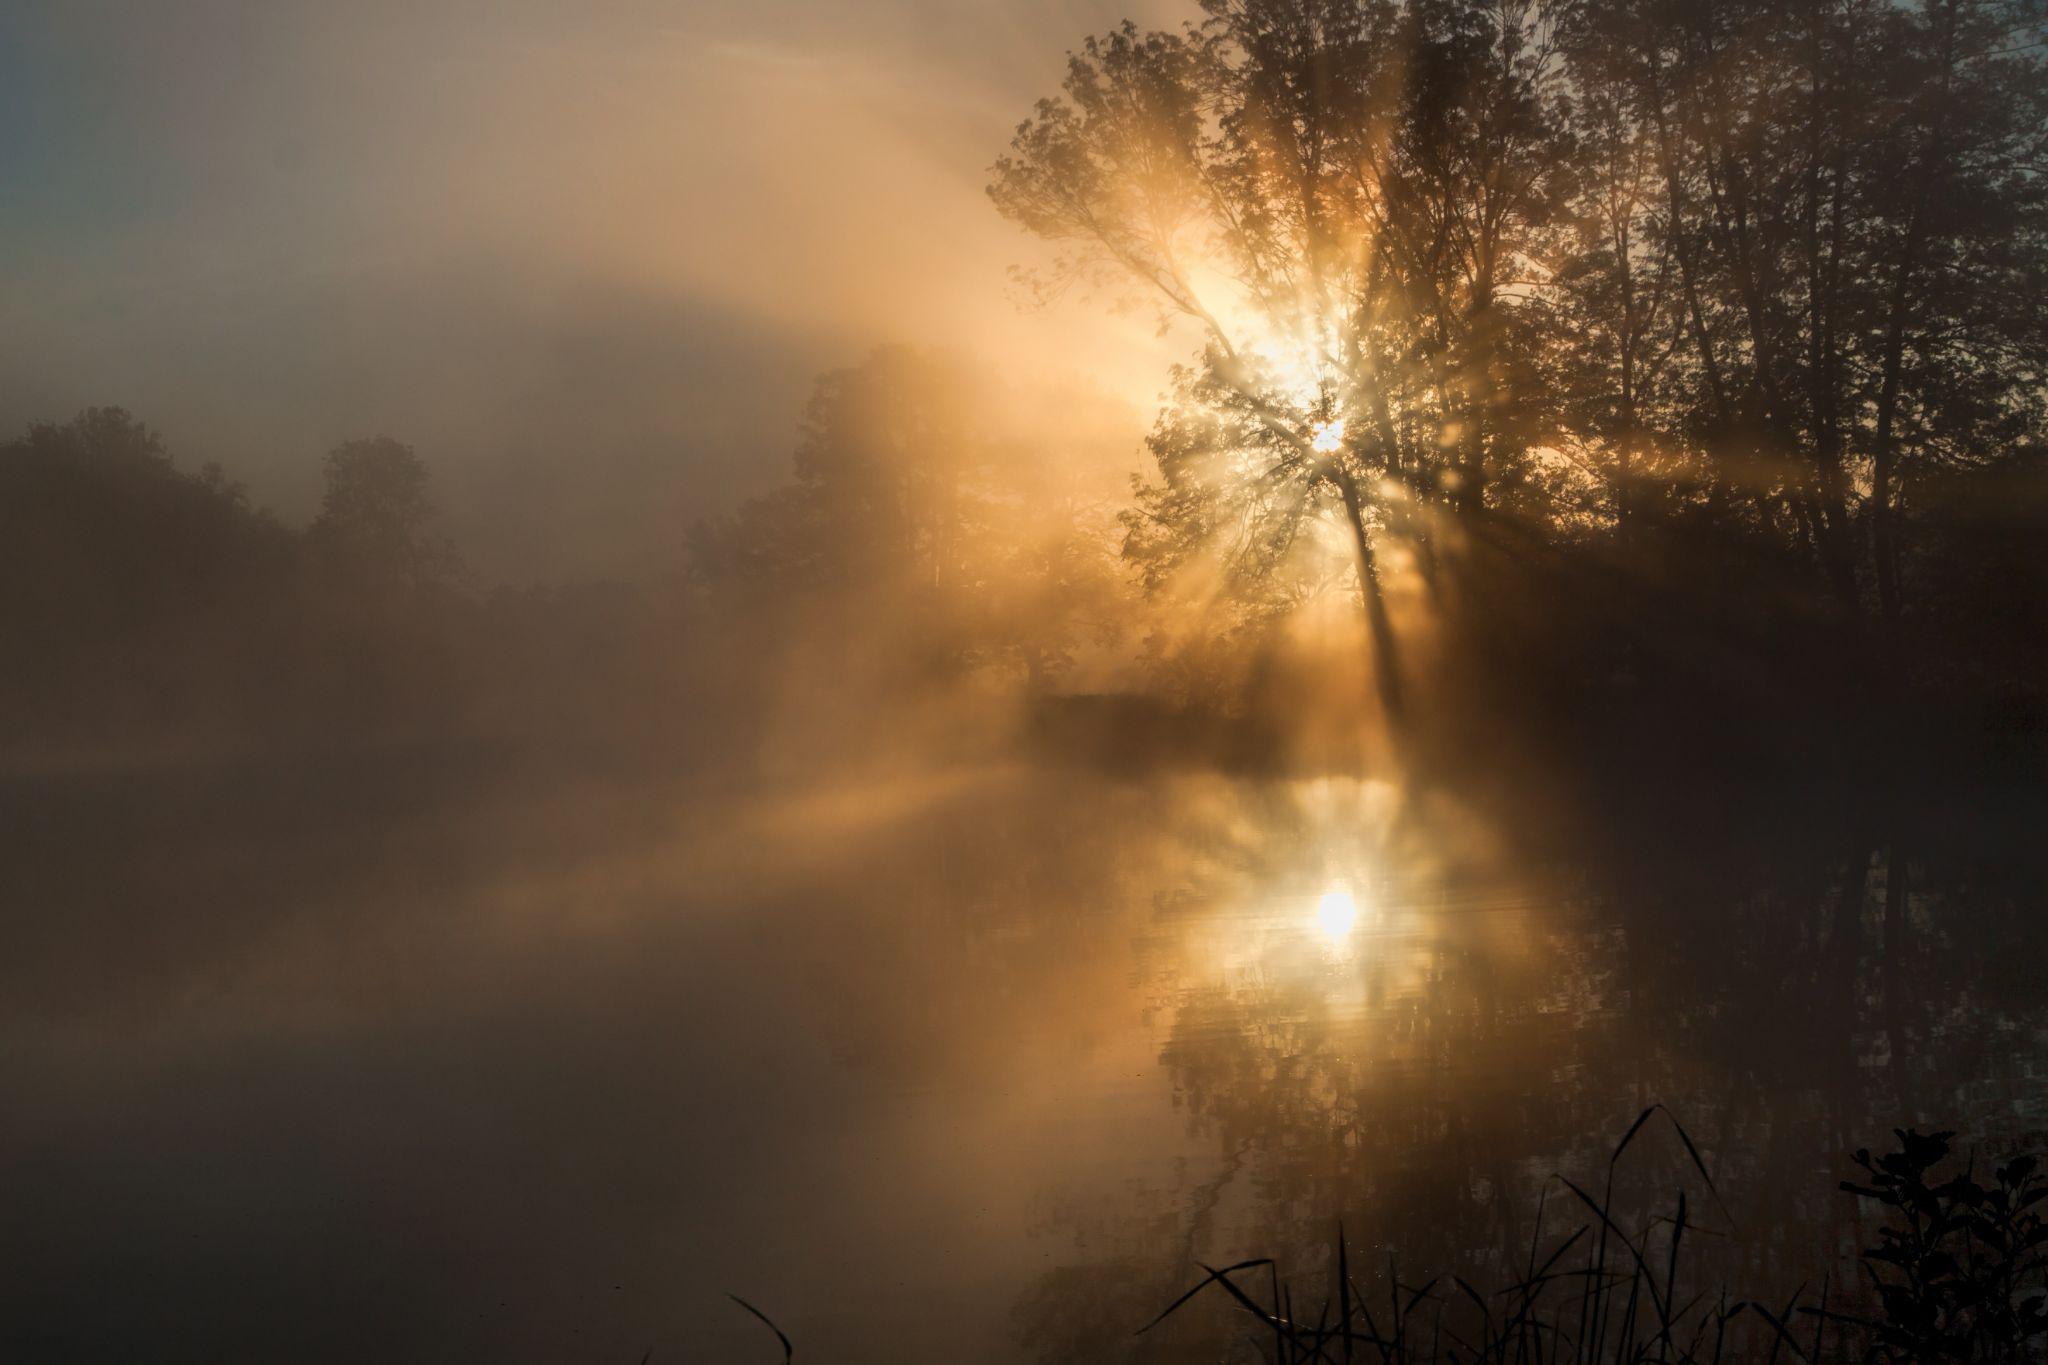 Sunrise at the lake, Germany